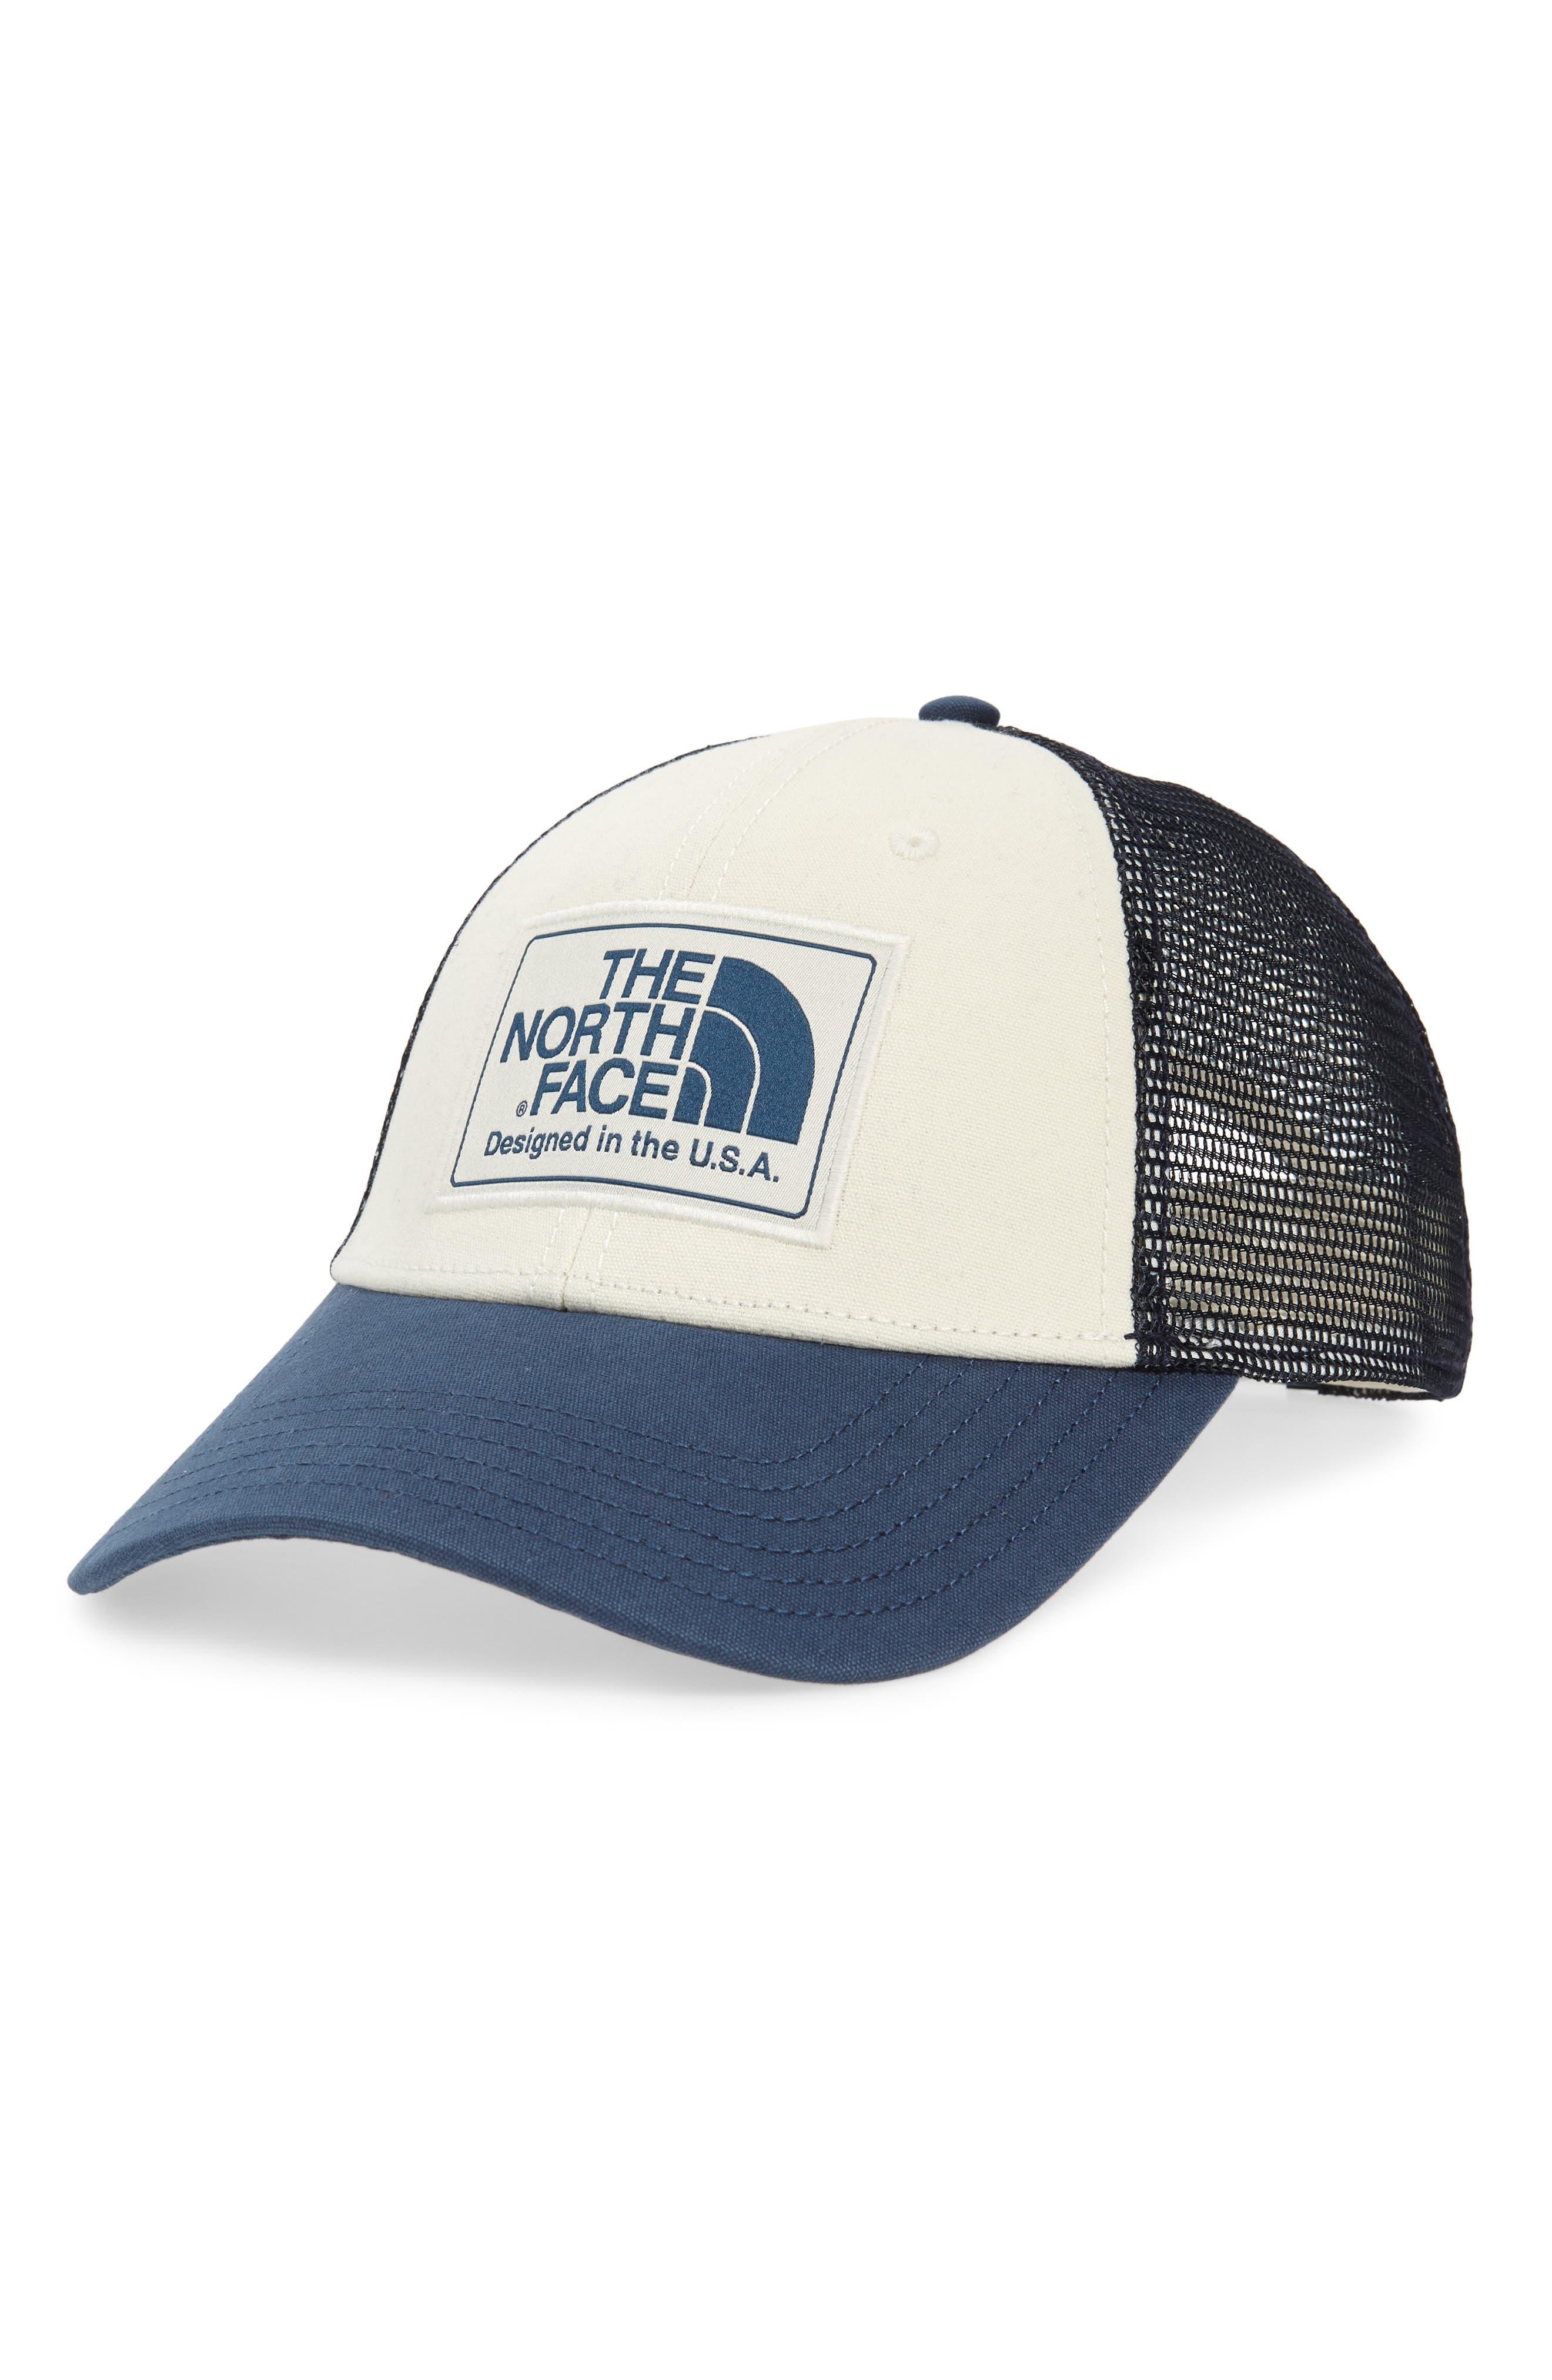 092d1bdec Men's The North Face Accessories | Nordstrom